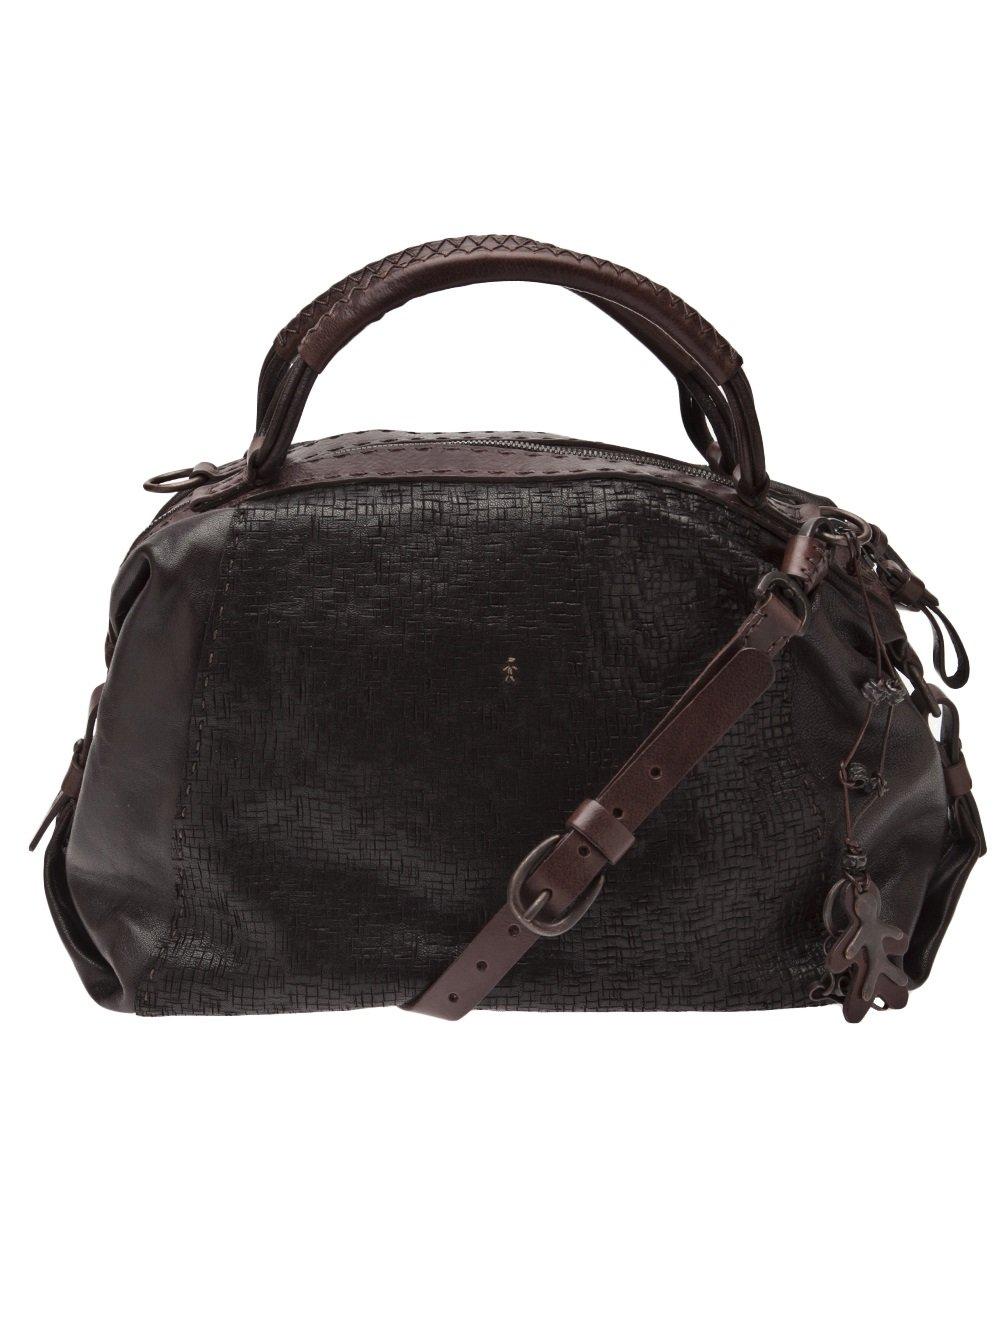 Henry Beguelin Arianna Bag In Black Lyst